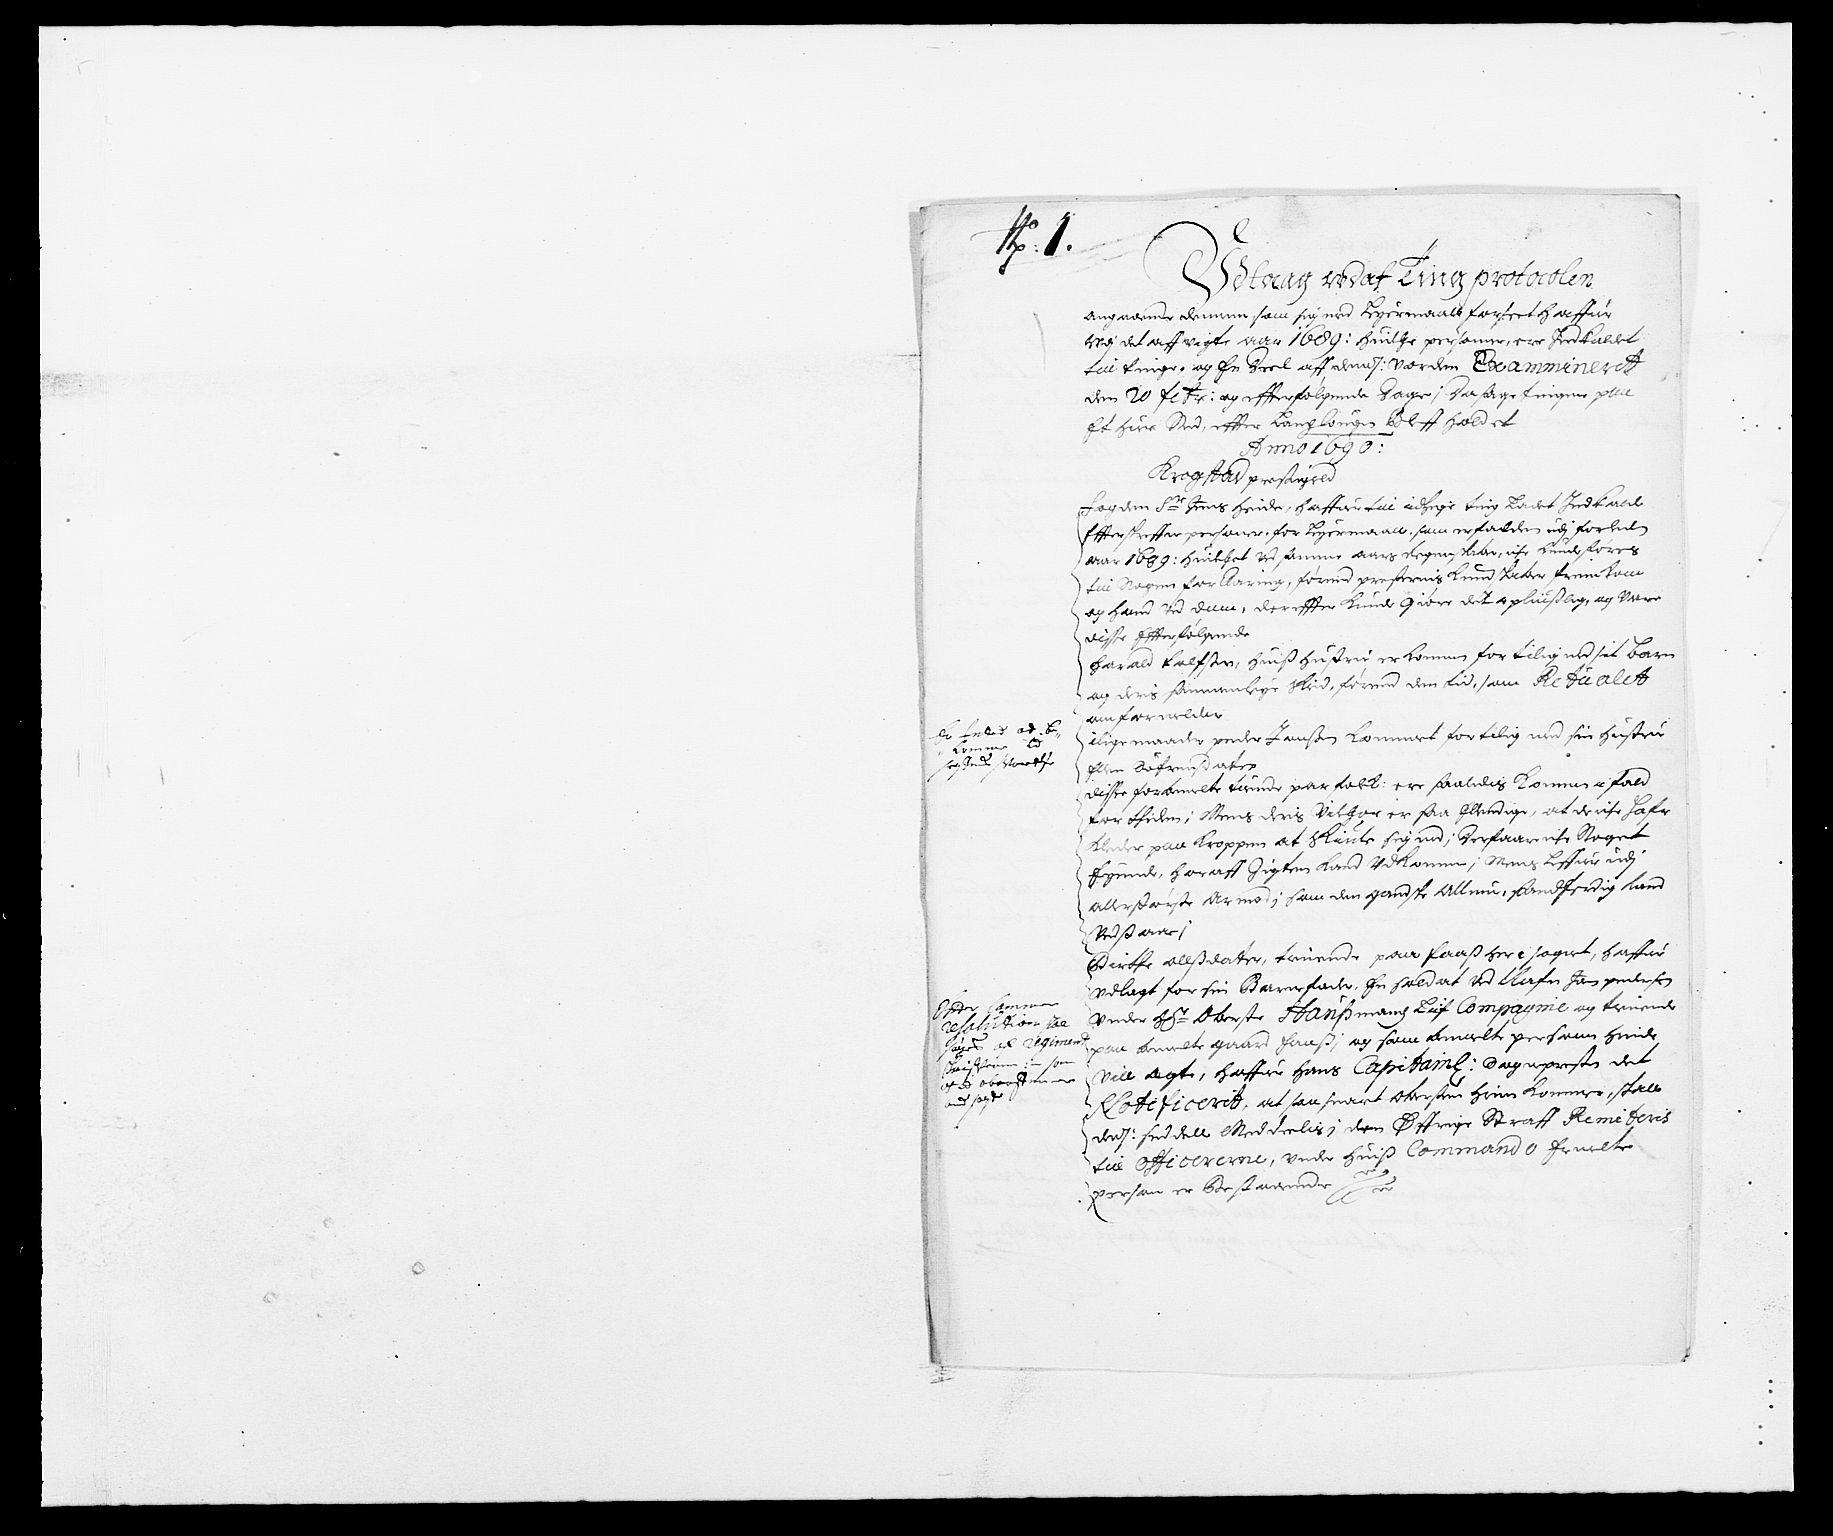 RA, Rentekammeret inntil 1814, Reviderte regnskaper, Fogderegnskap, R09/L0435: Fogderegnskap Follo, 1689-1691, s. 388